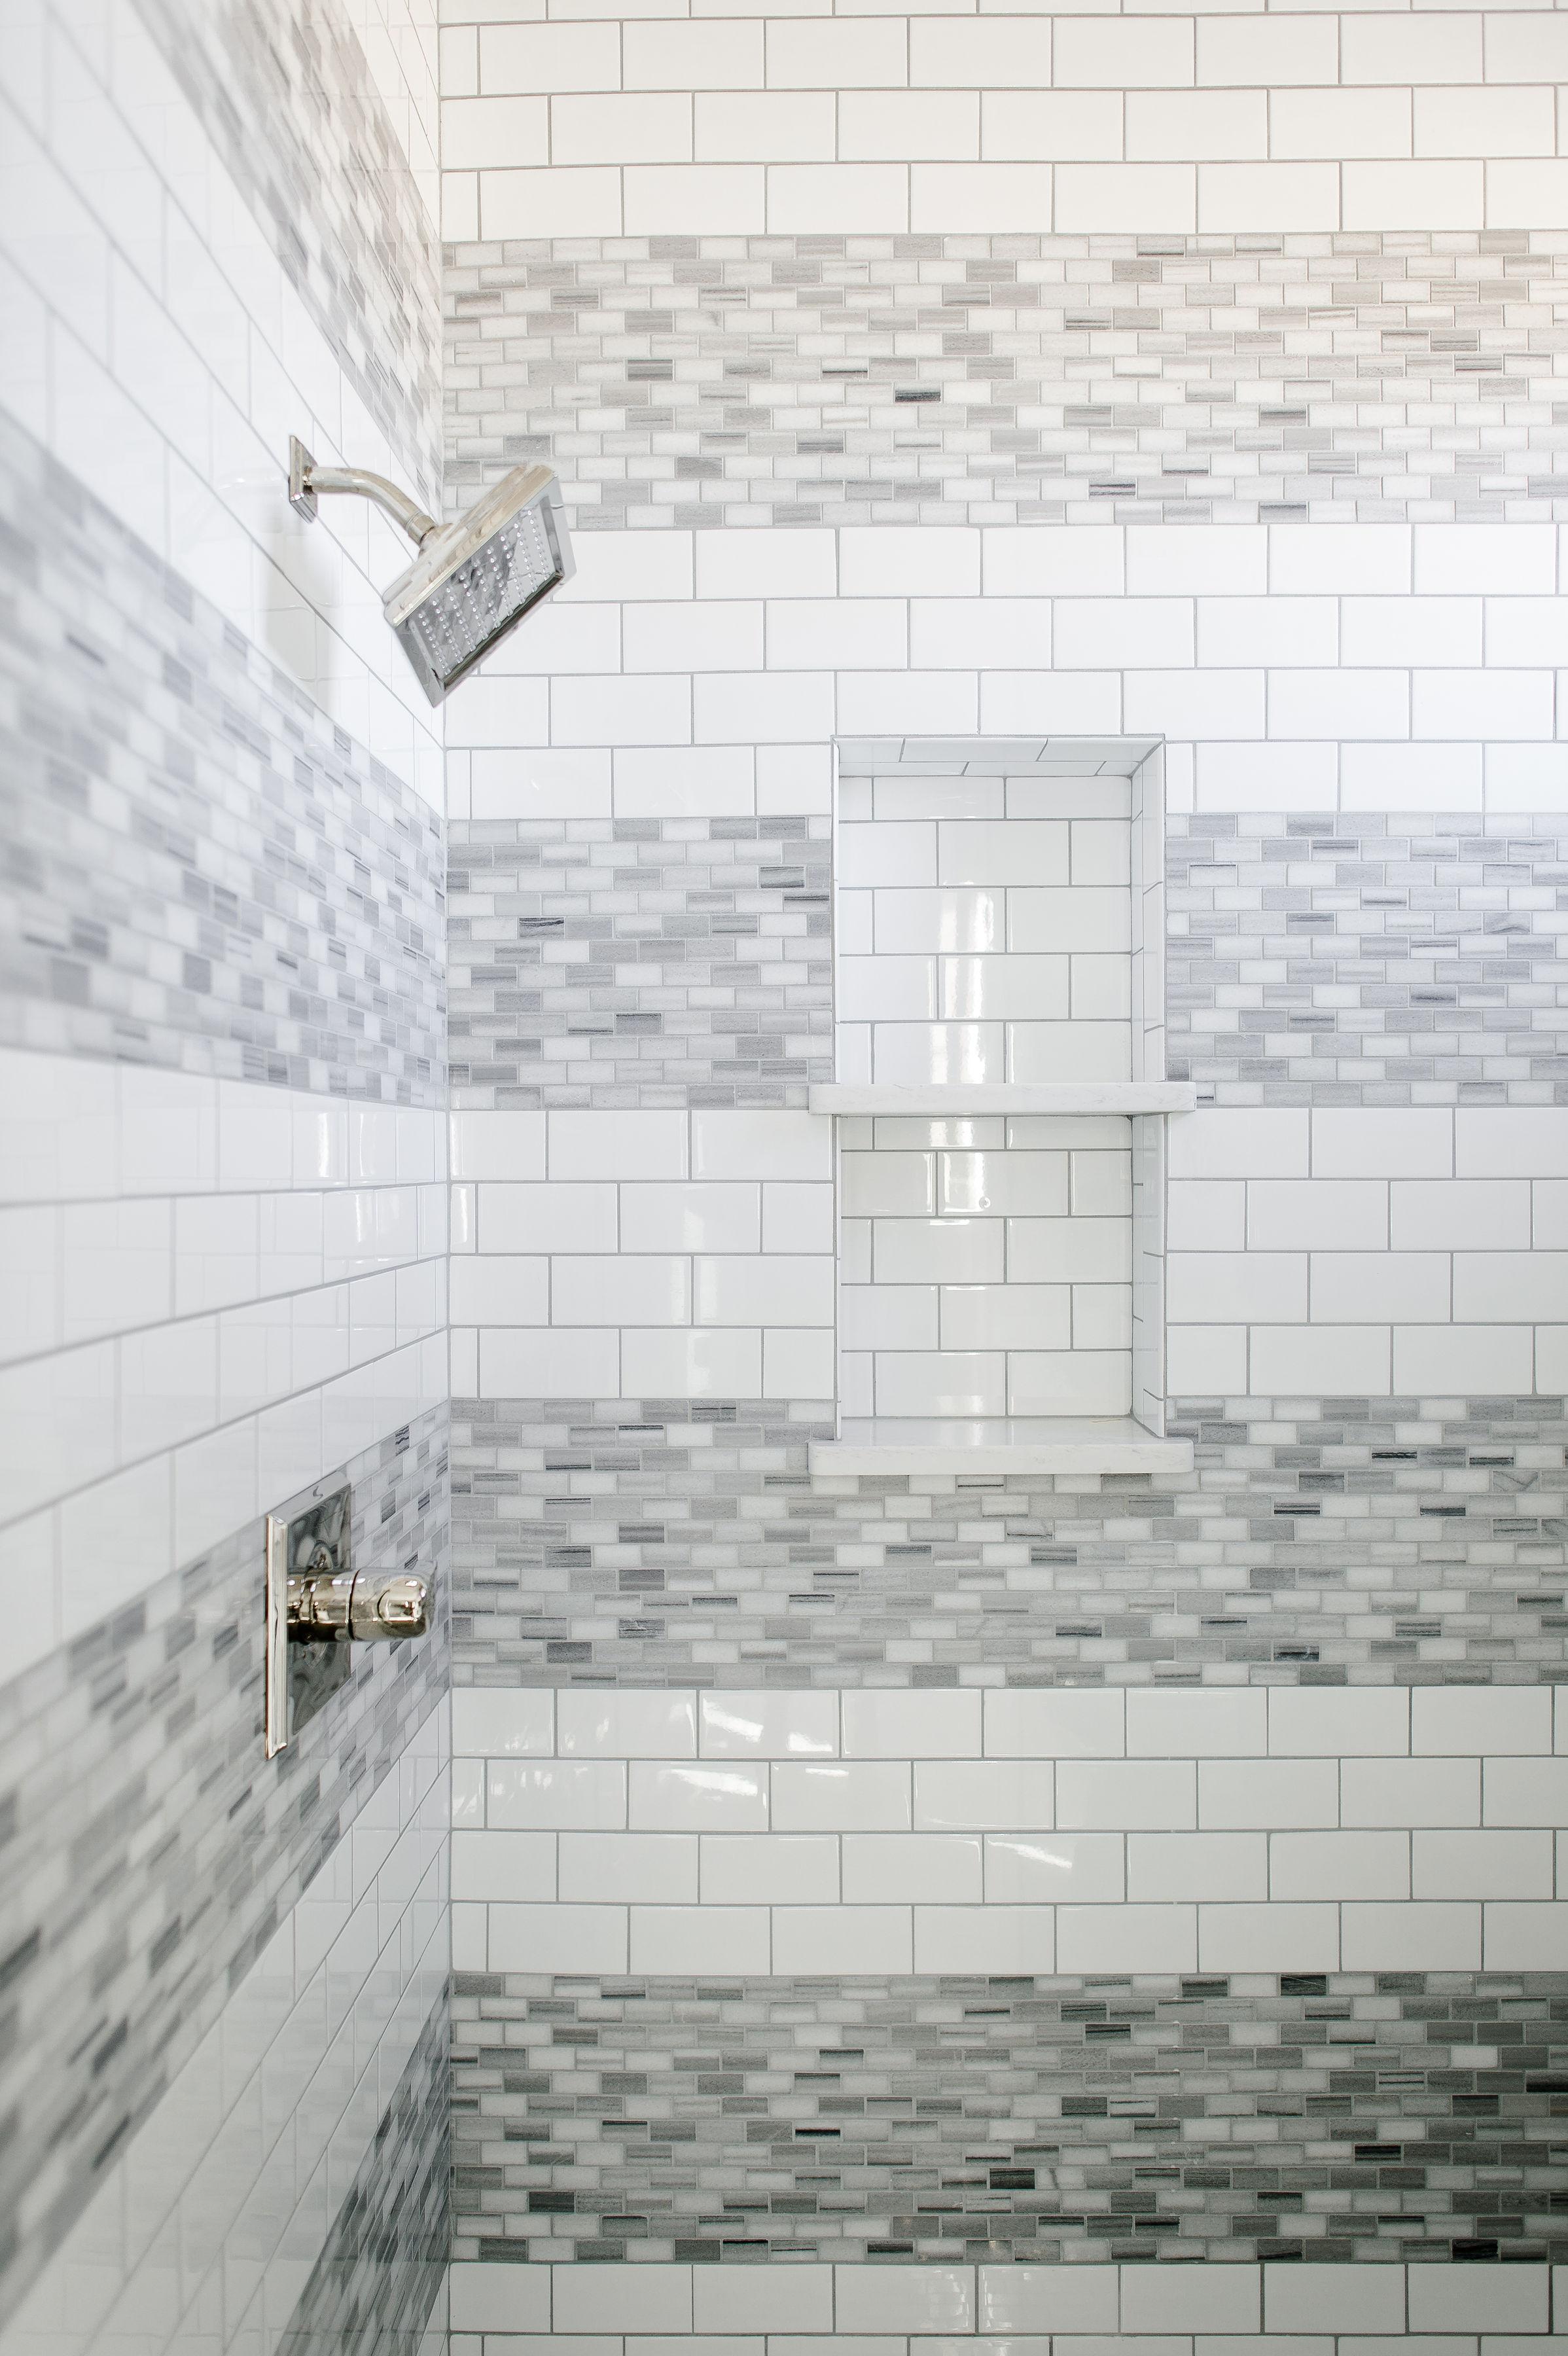 hill-country-transitional-clark-design-studio-wichita-falls-tx-kids-bathroom-grey-and-white.jpg